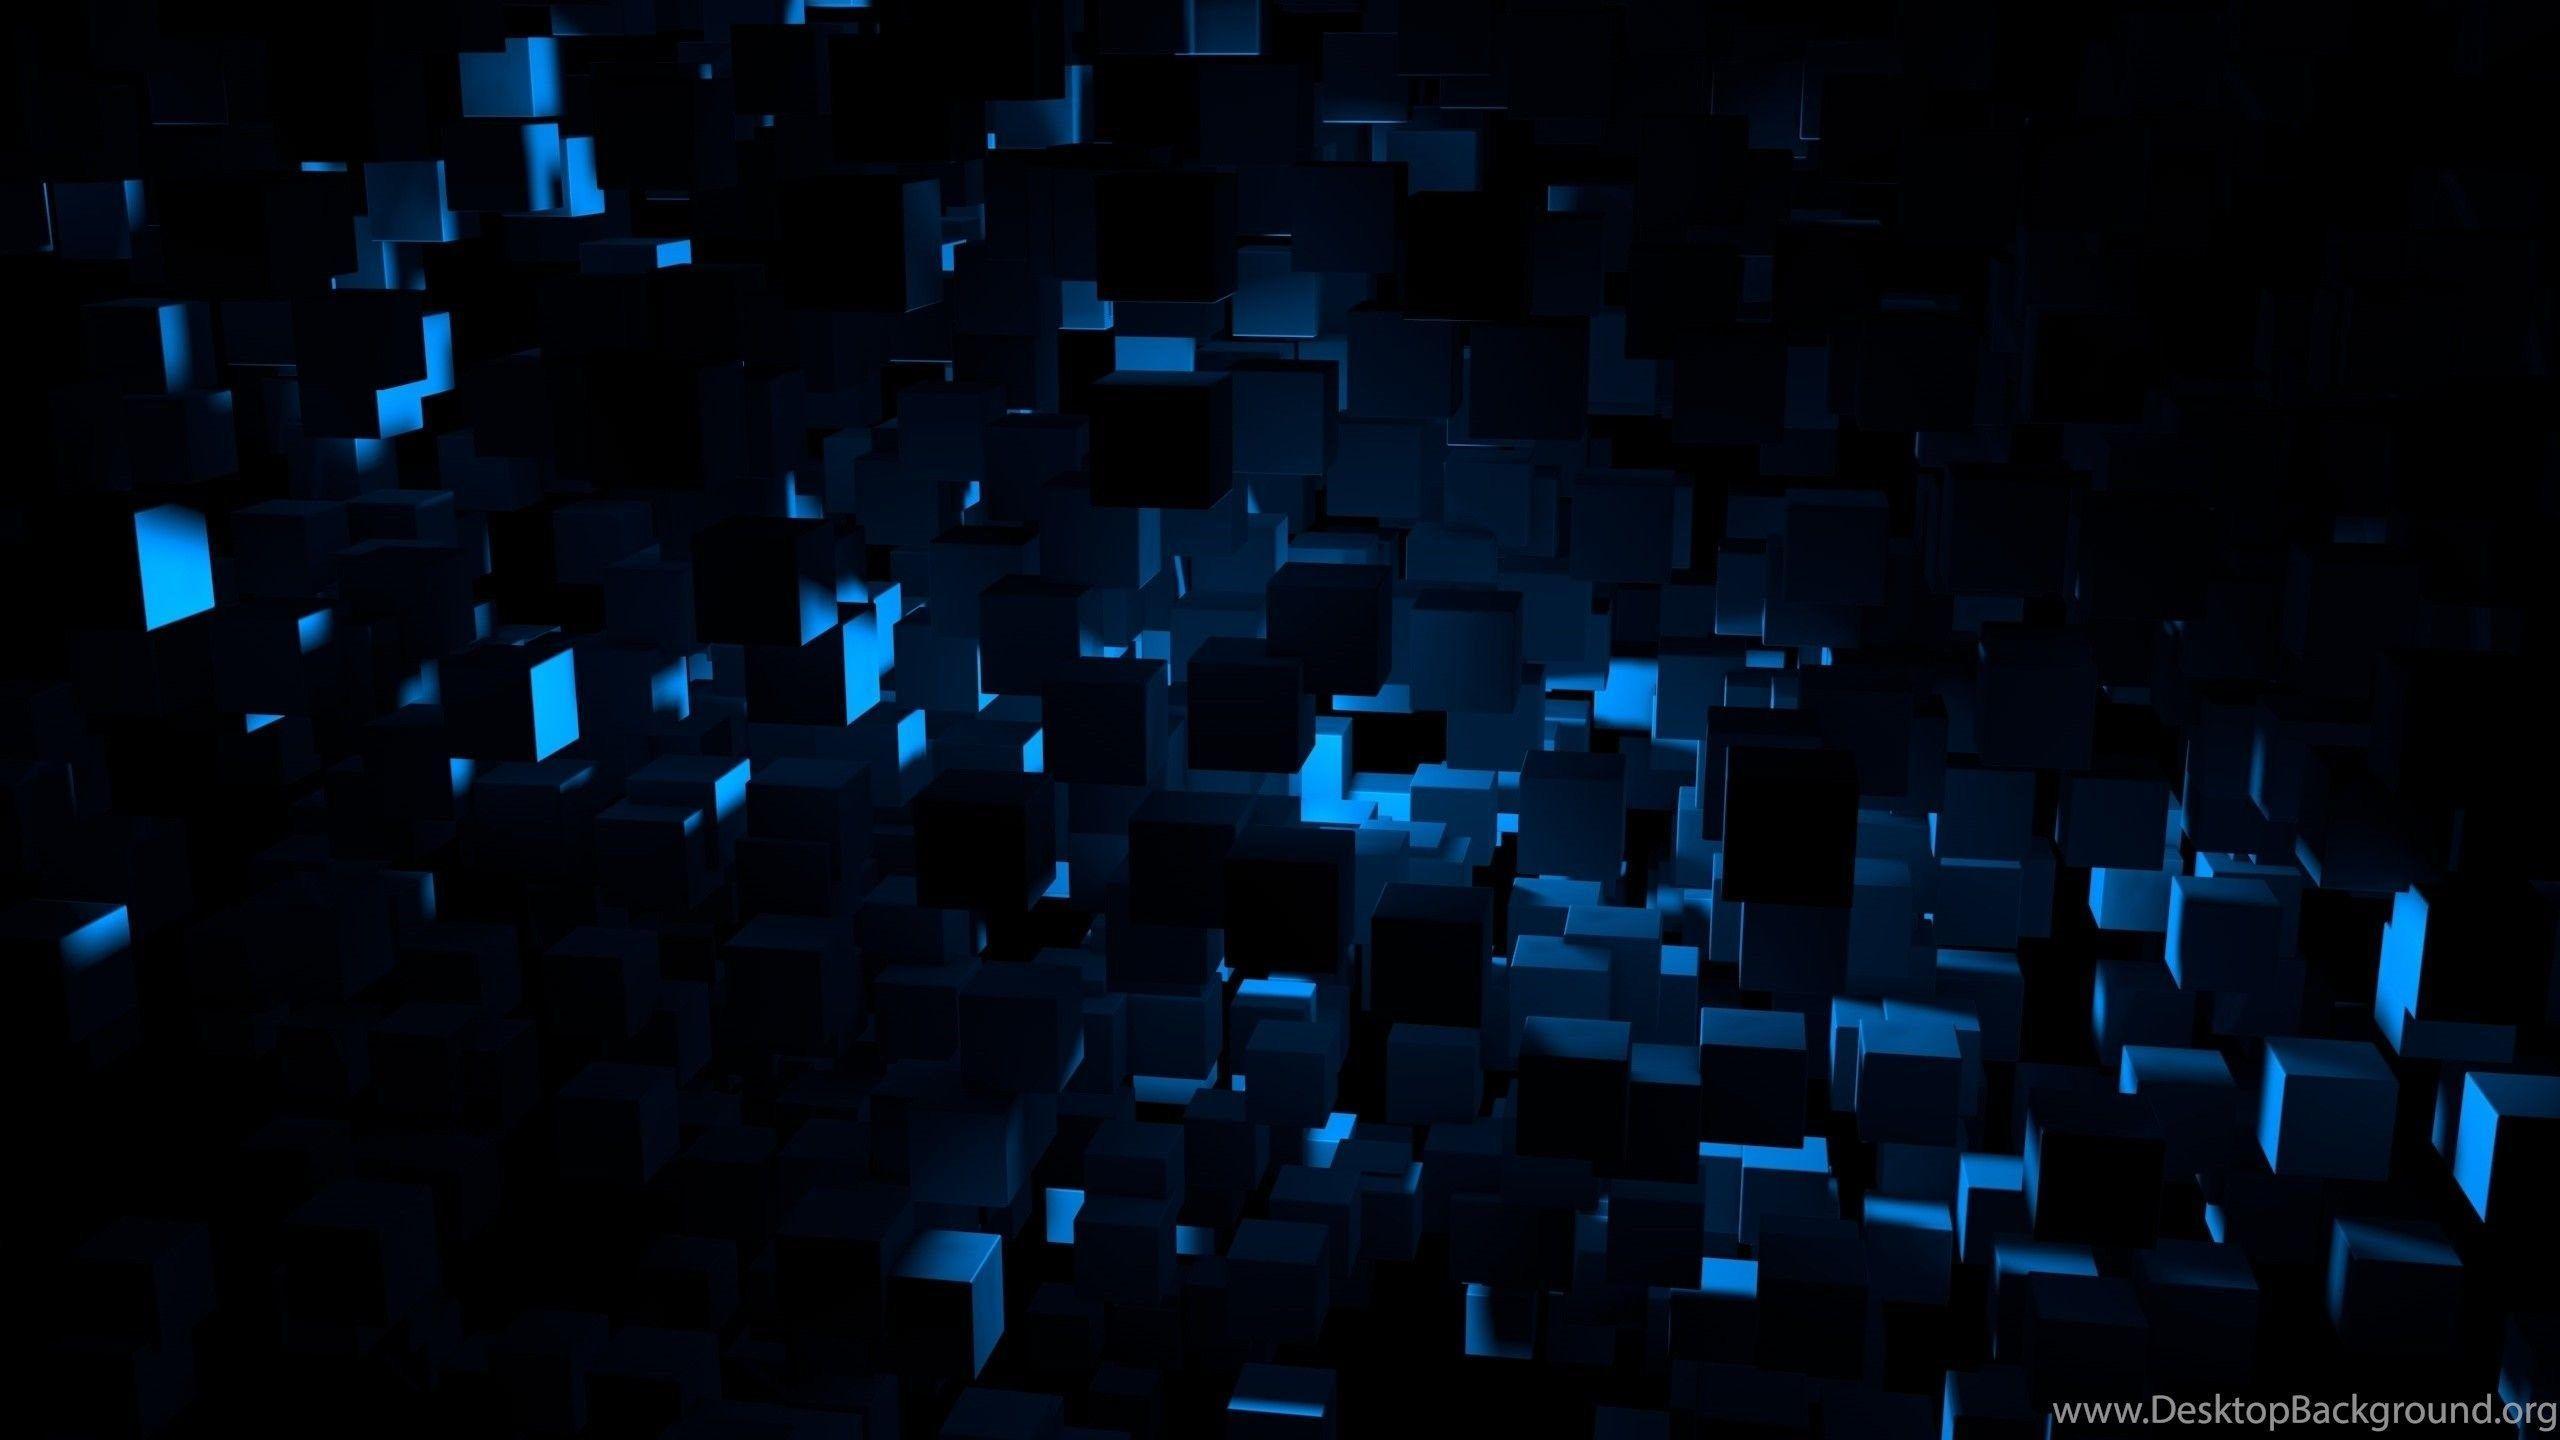 Cinema 4d Wallpapers Top Free Cinema 4d Backgrounds